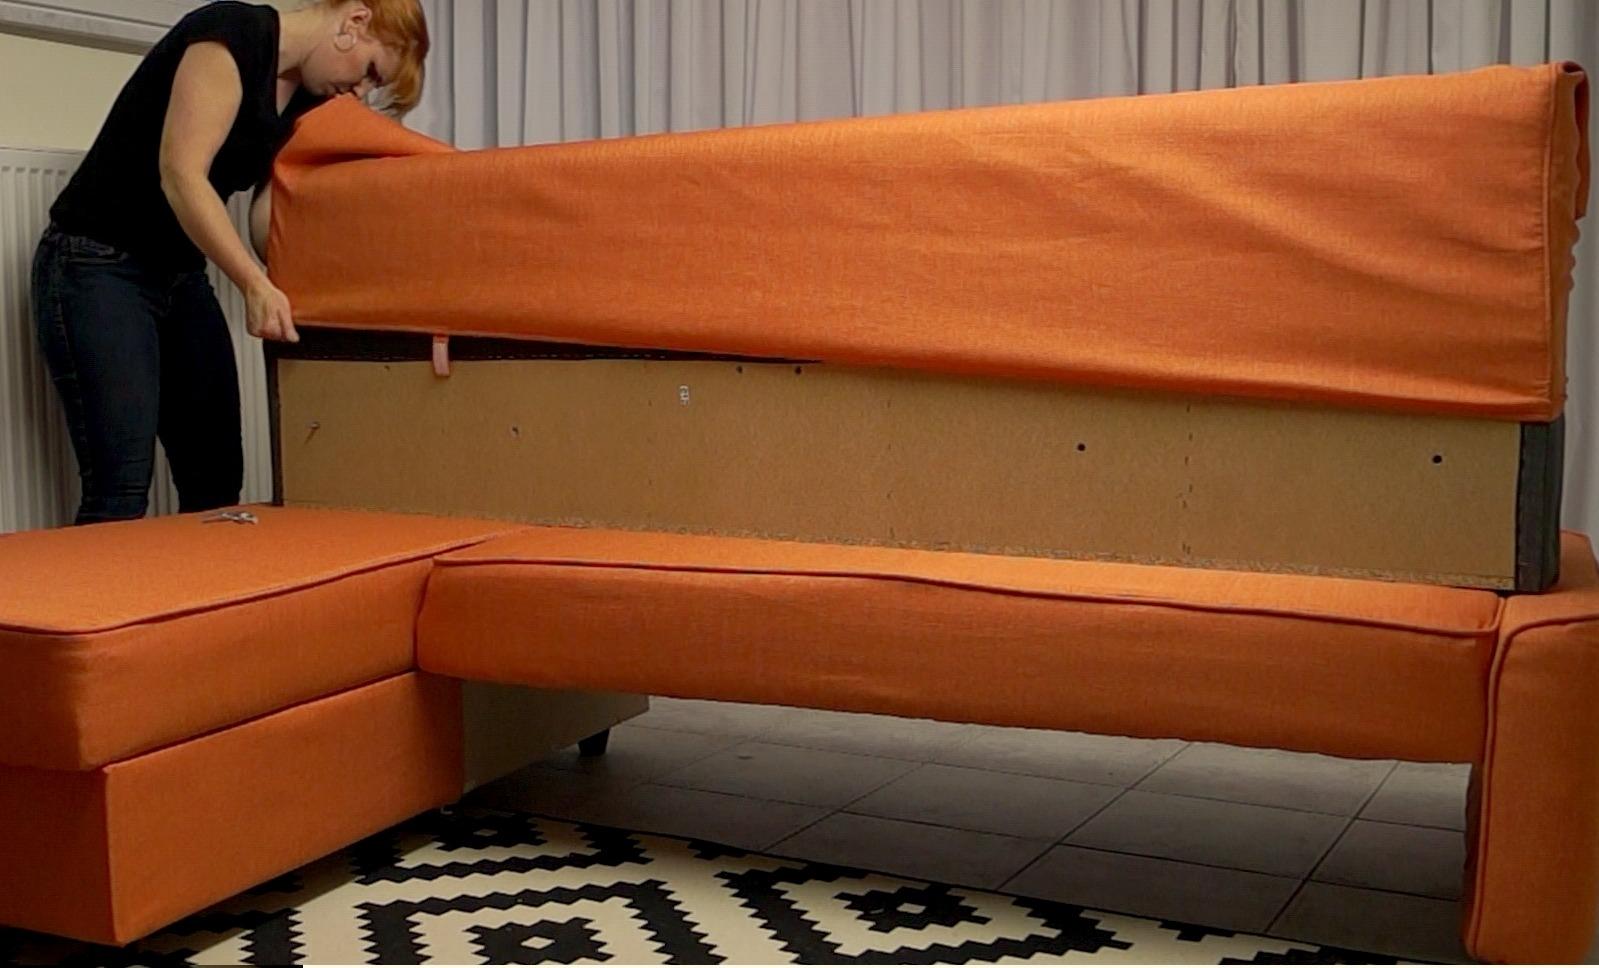 Comfort Works FRIHETEN Slipcover Review on ikea moheda couch, friheten sofa review, ikea brimnes daybed, ikea jappling chair club, ikea lugnvik, ikea corner storage, ikea karlsvik, ikea henrika pillow, ikea besta, ikea klamby art,